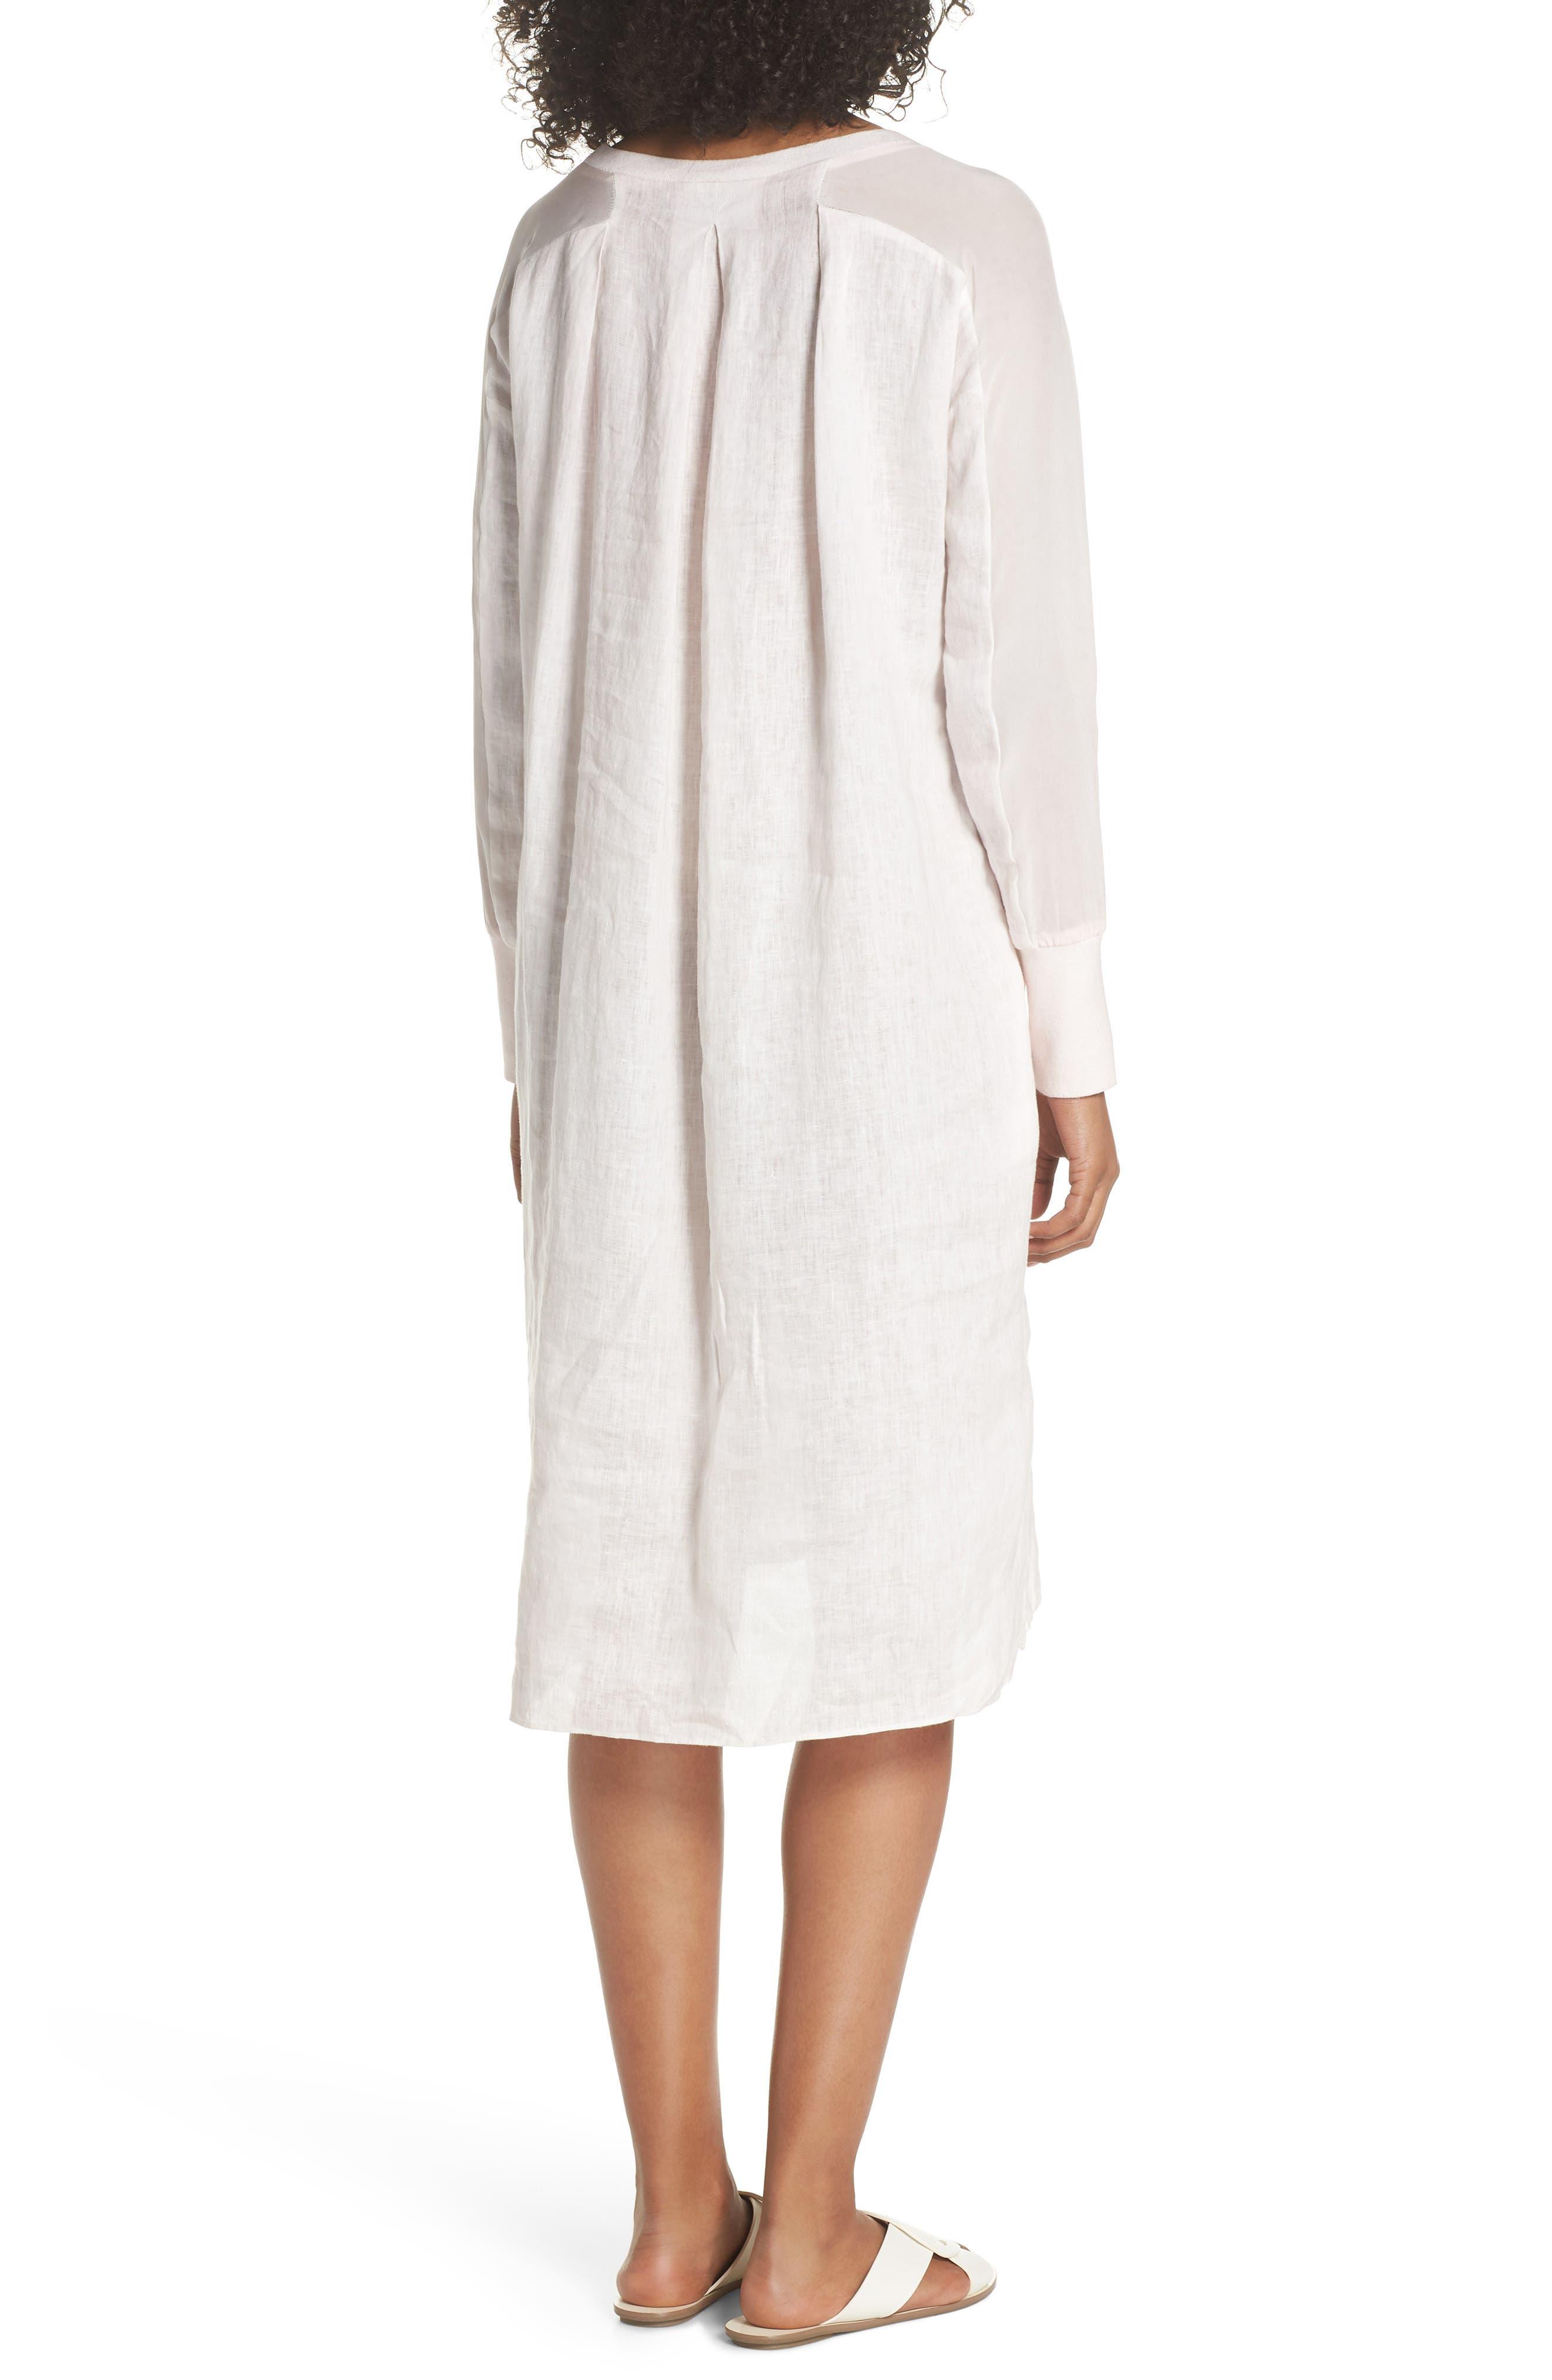 Rata Linen Shift Dress,                             Alternate thumbnail 2, color,                             Light Pink